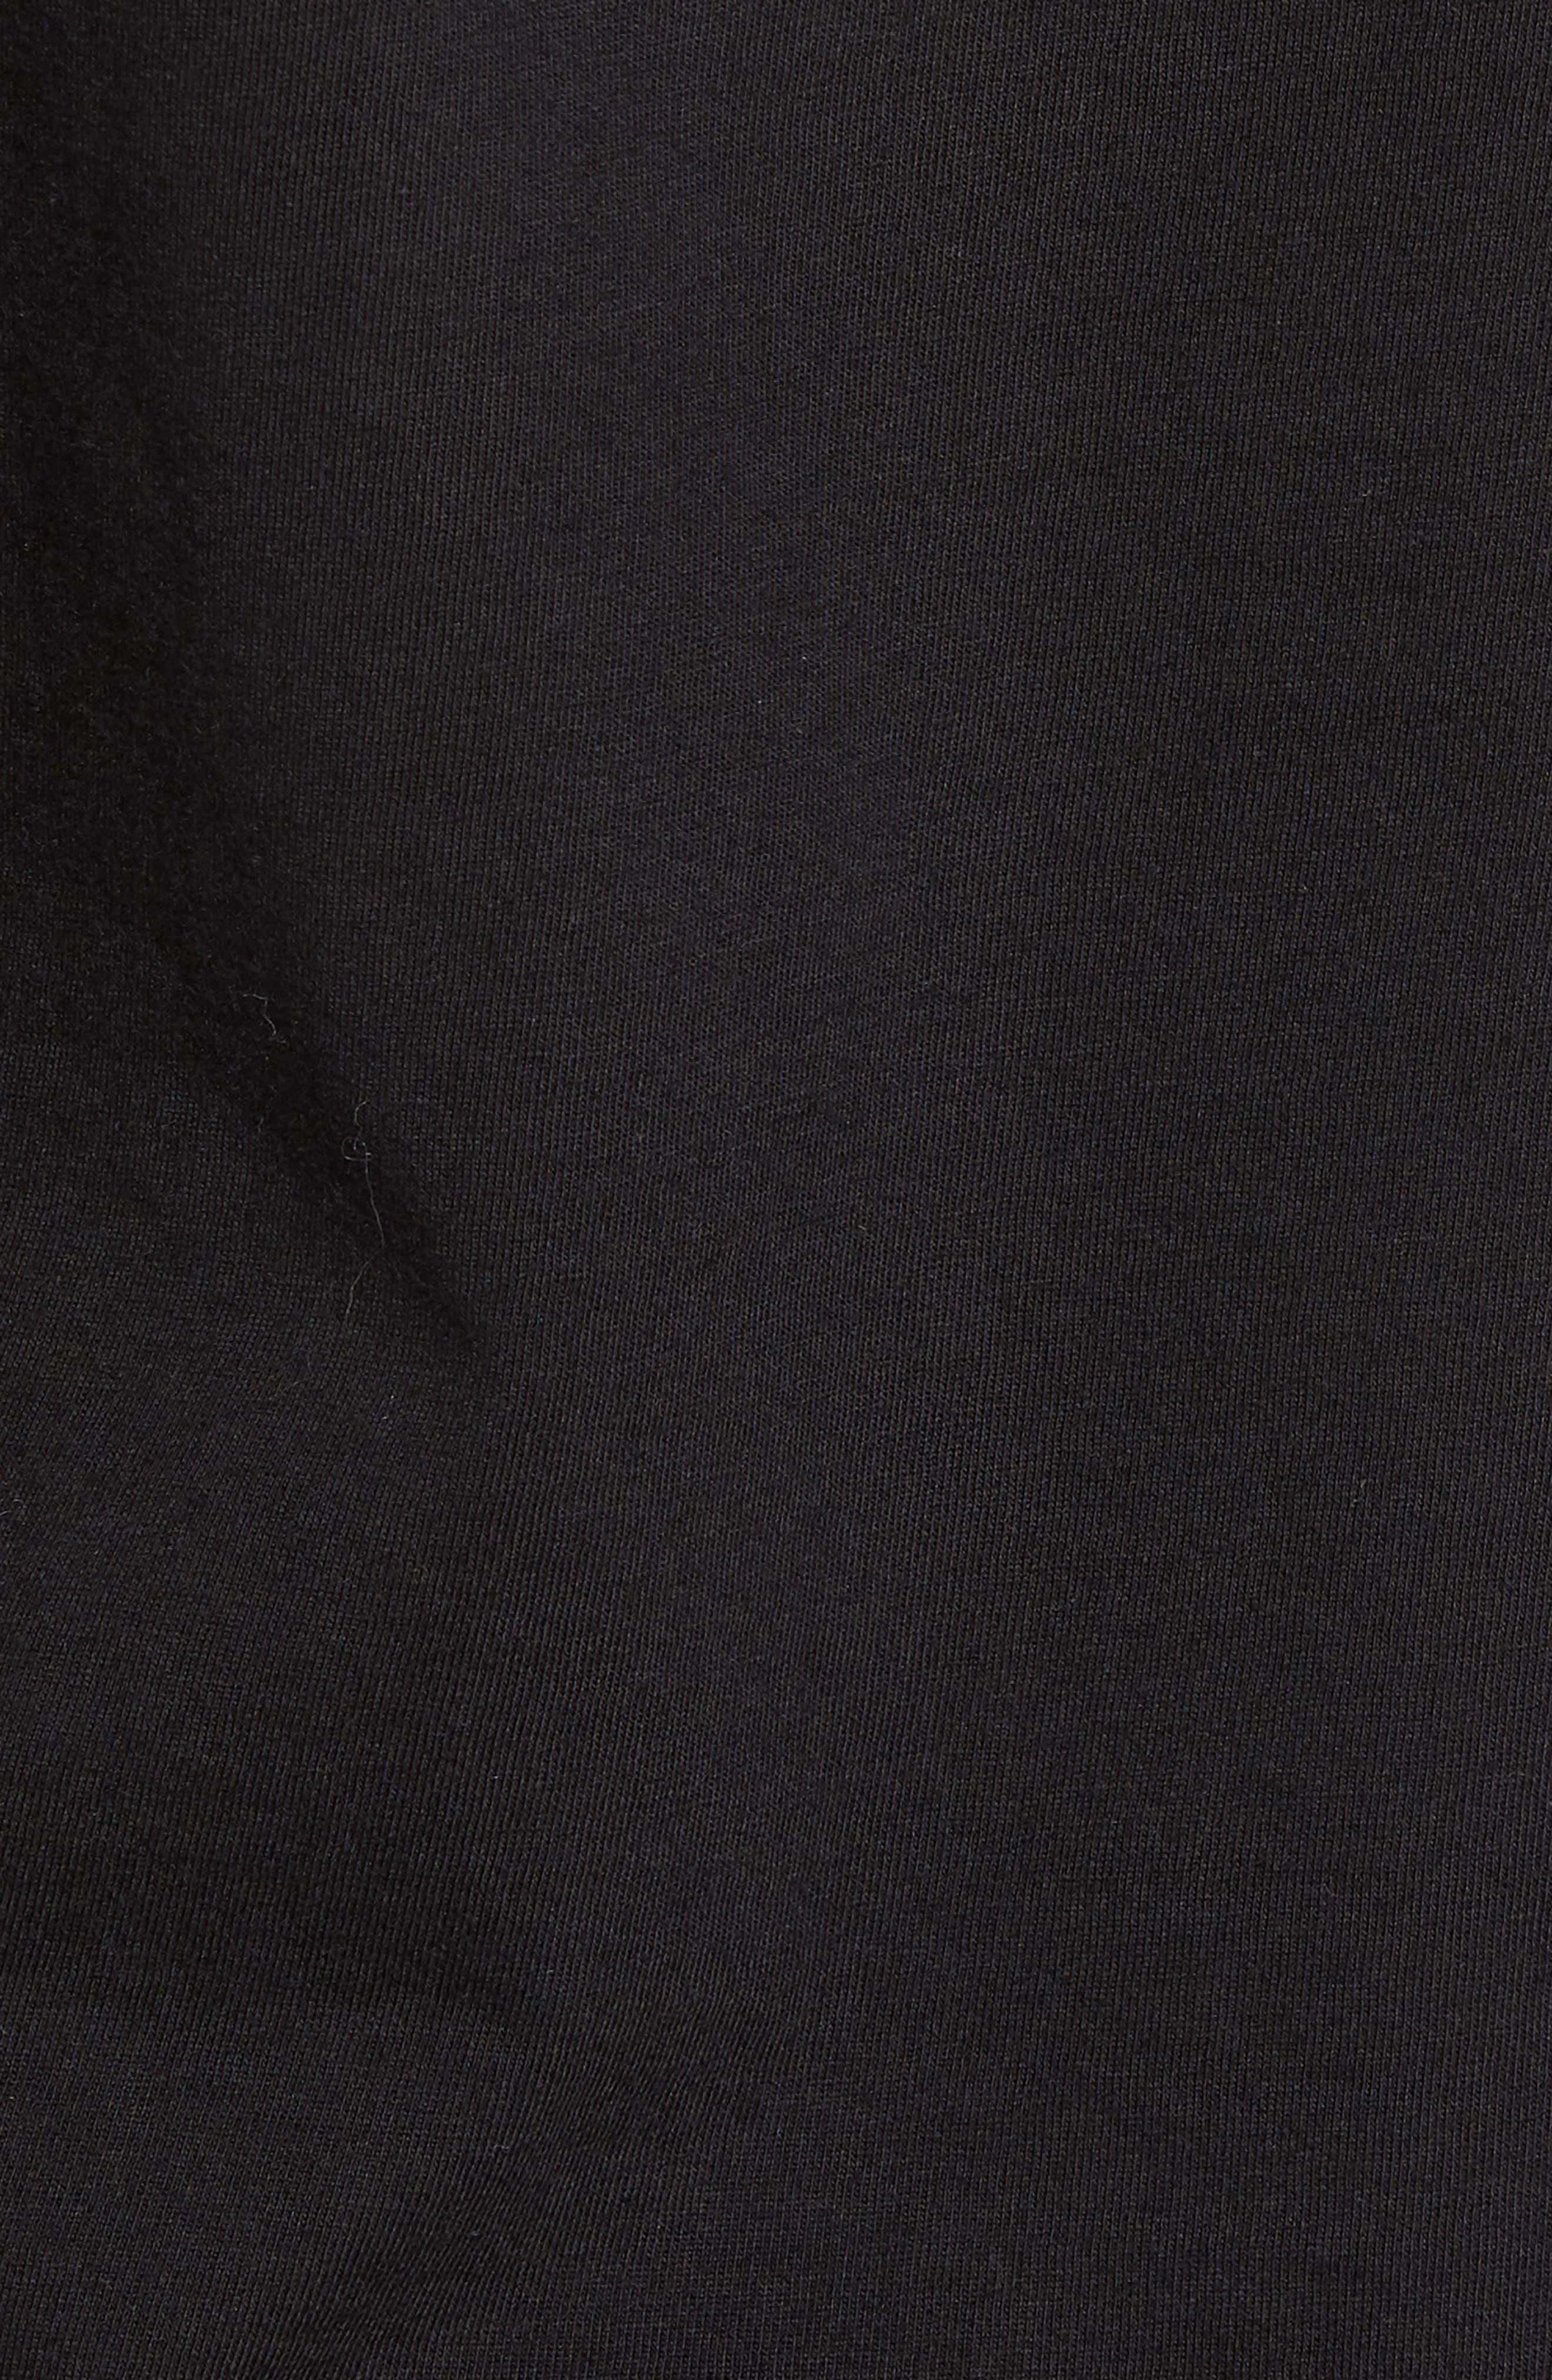 Enemy Graphic T-Shirt,                             Alternate thumbnail 5, color,                             Black